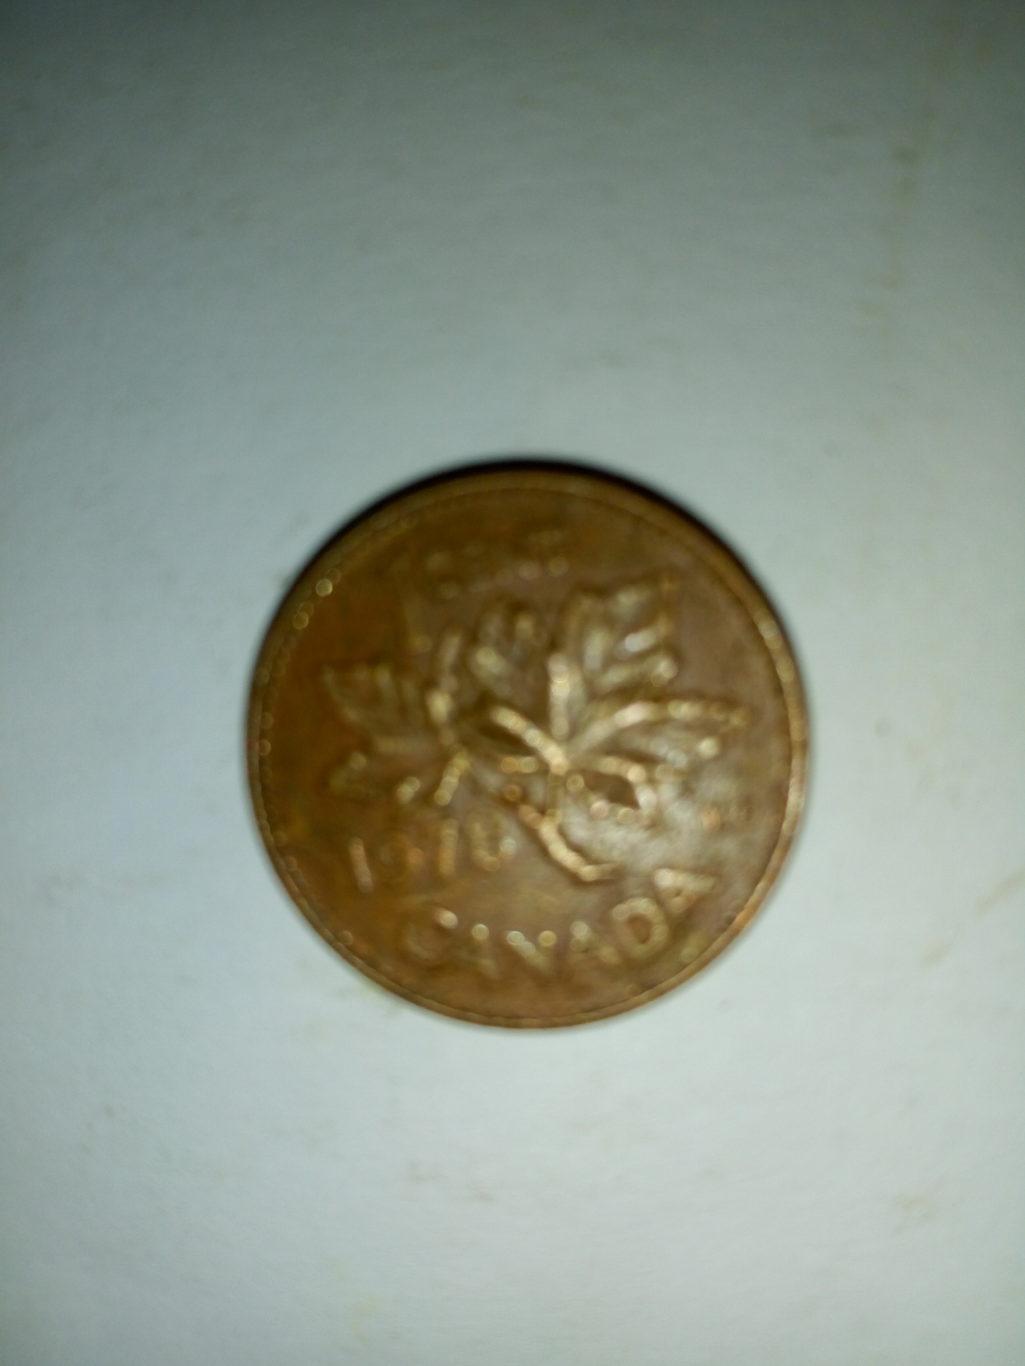 1978_Elizabeth 11 1 cent canada